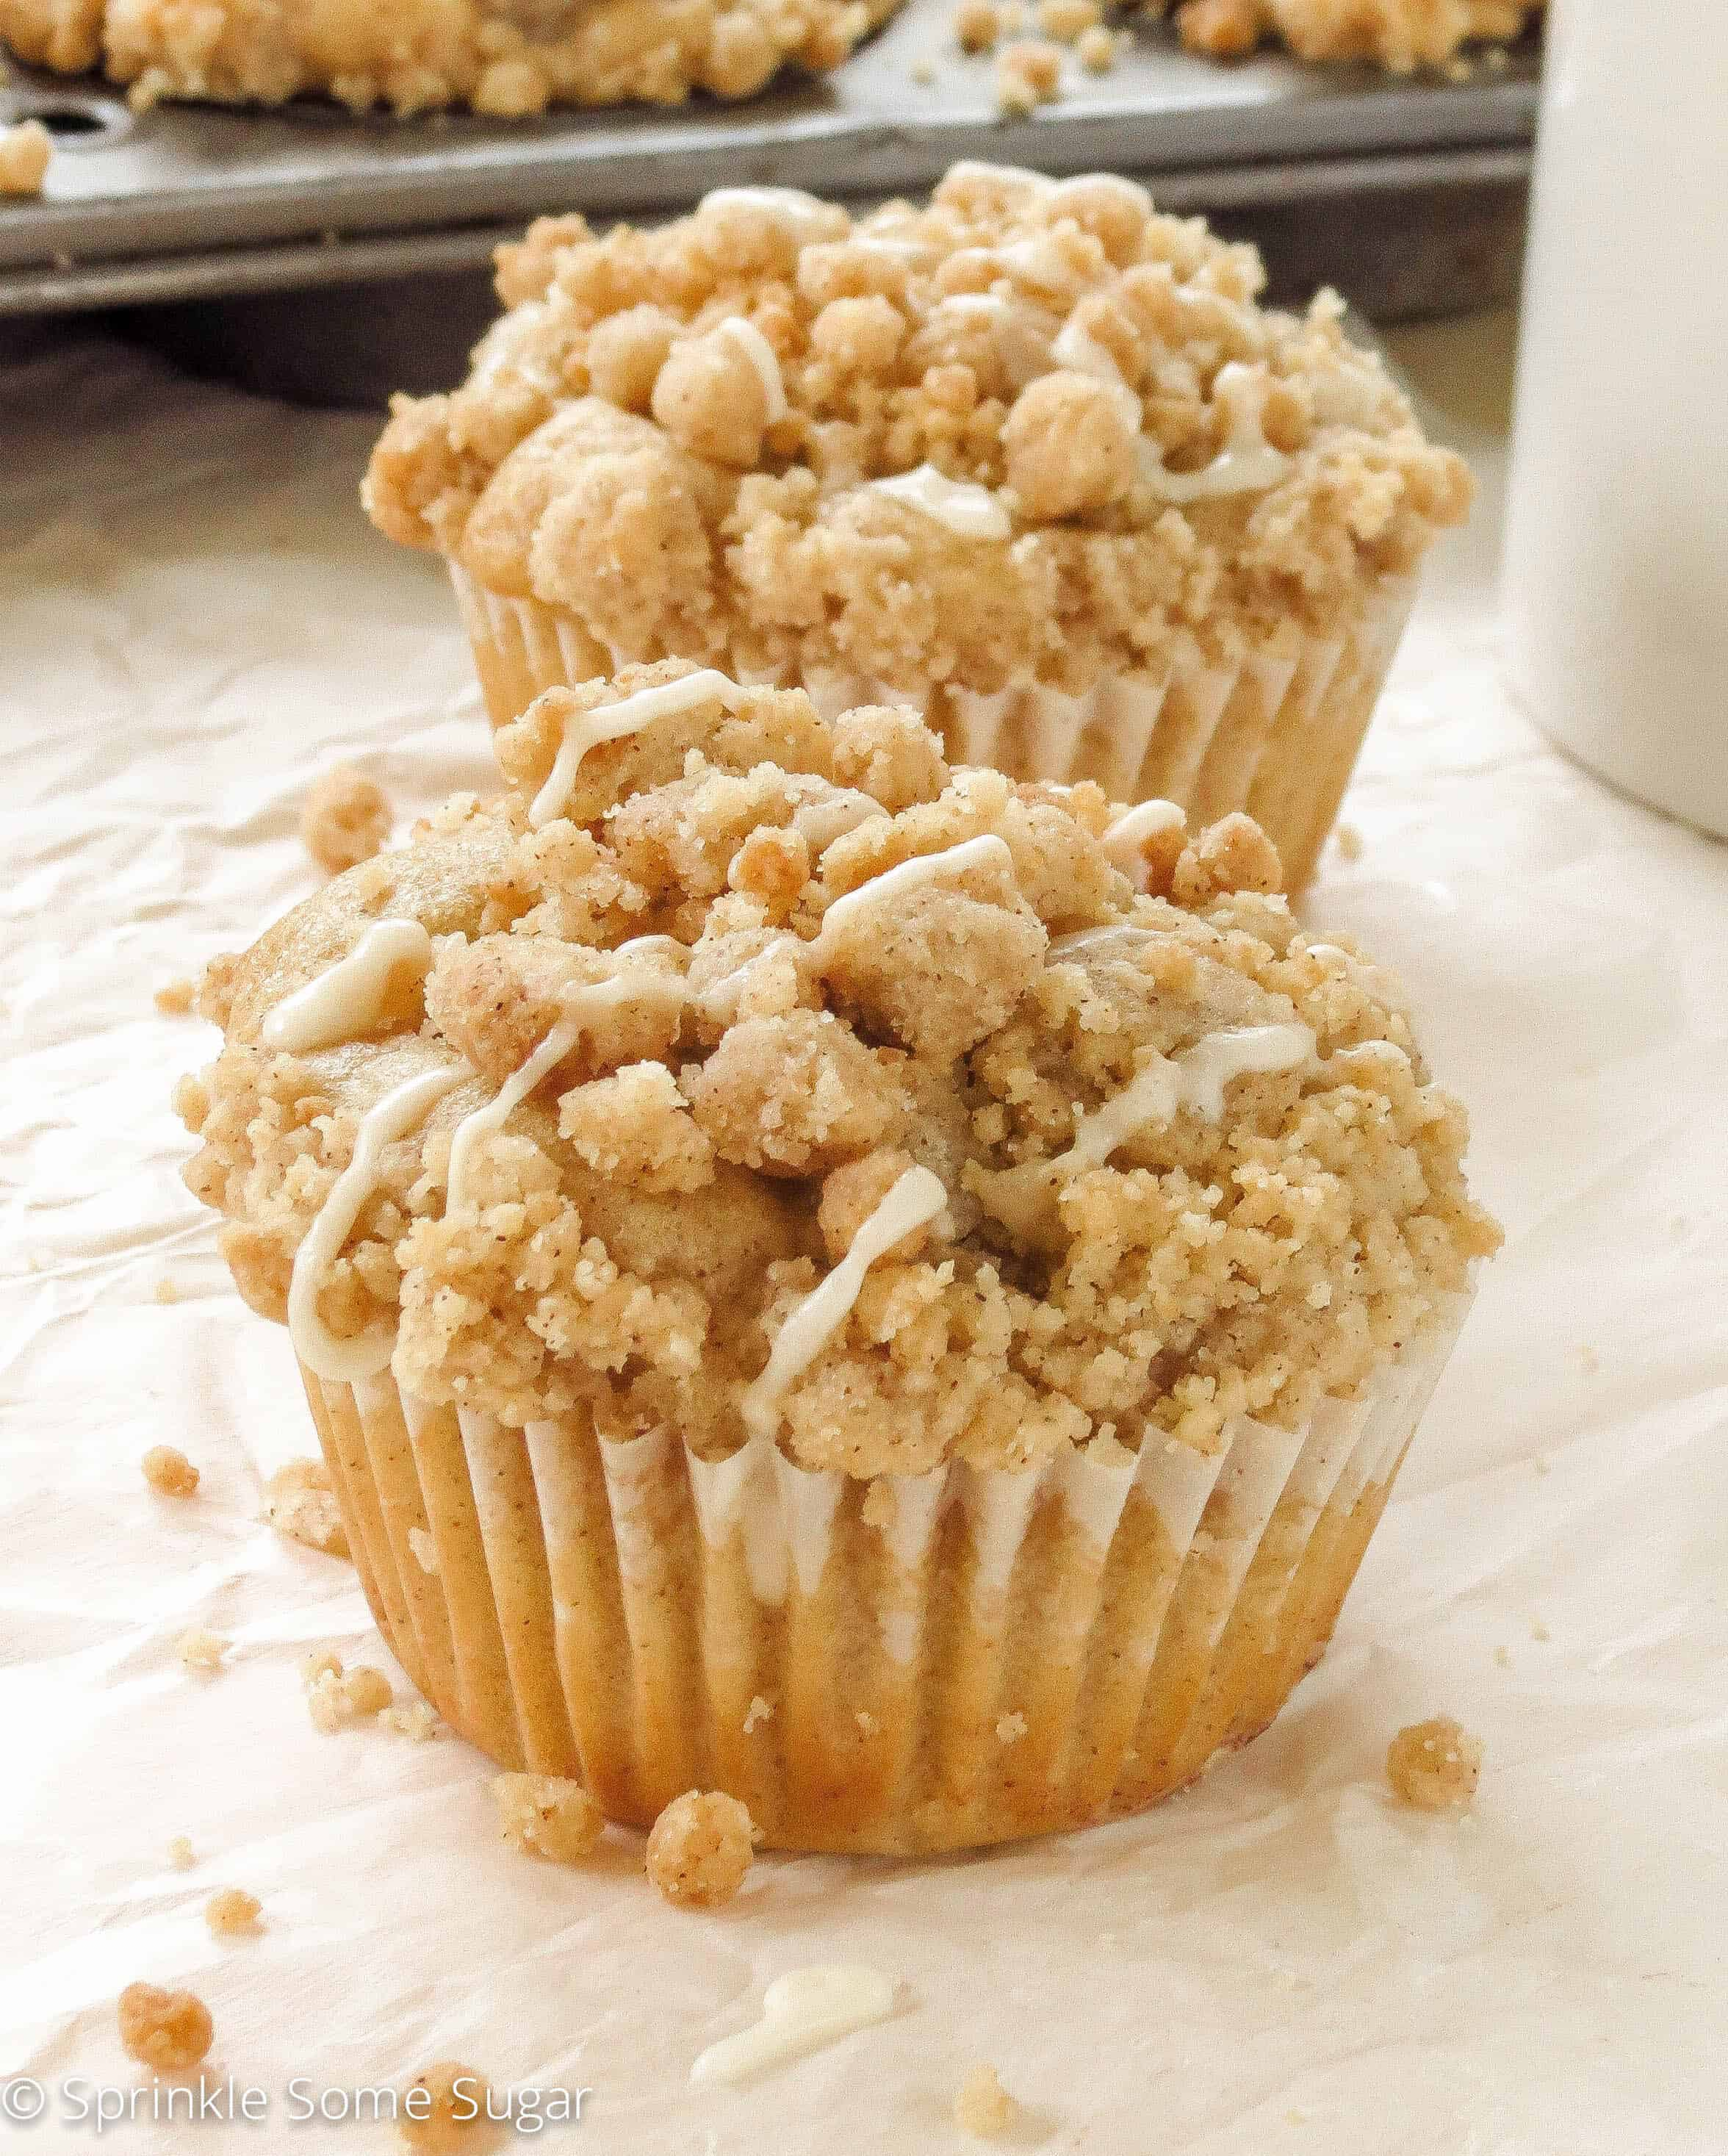 Cinnamon Swirl Coffee Cake Muffins - Sprinkle Some Sugar